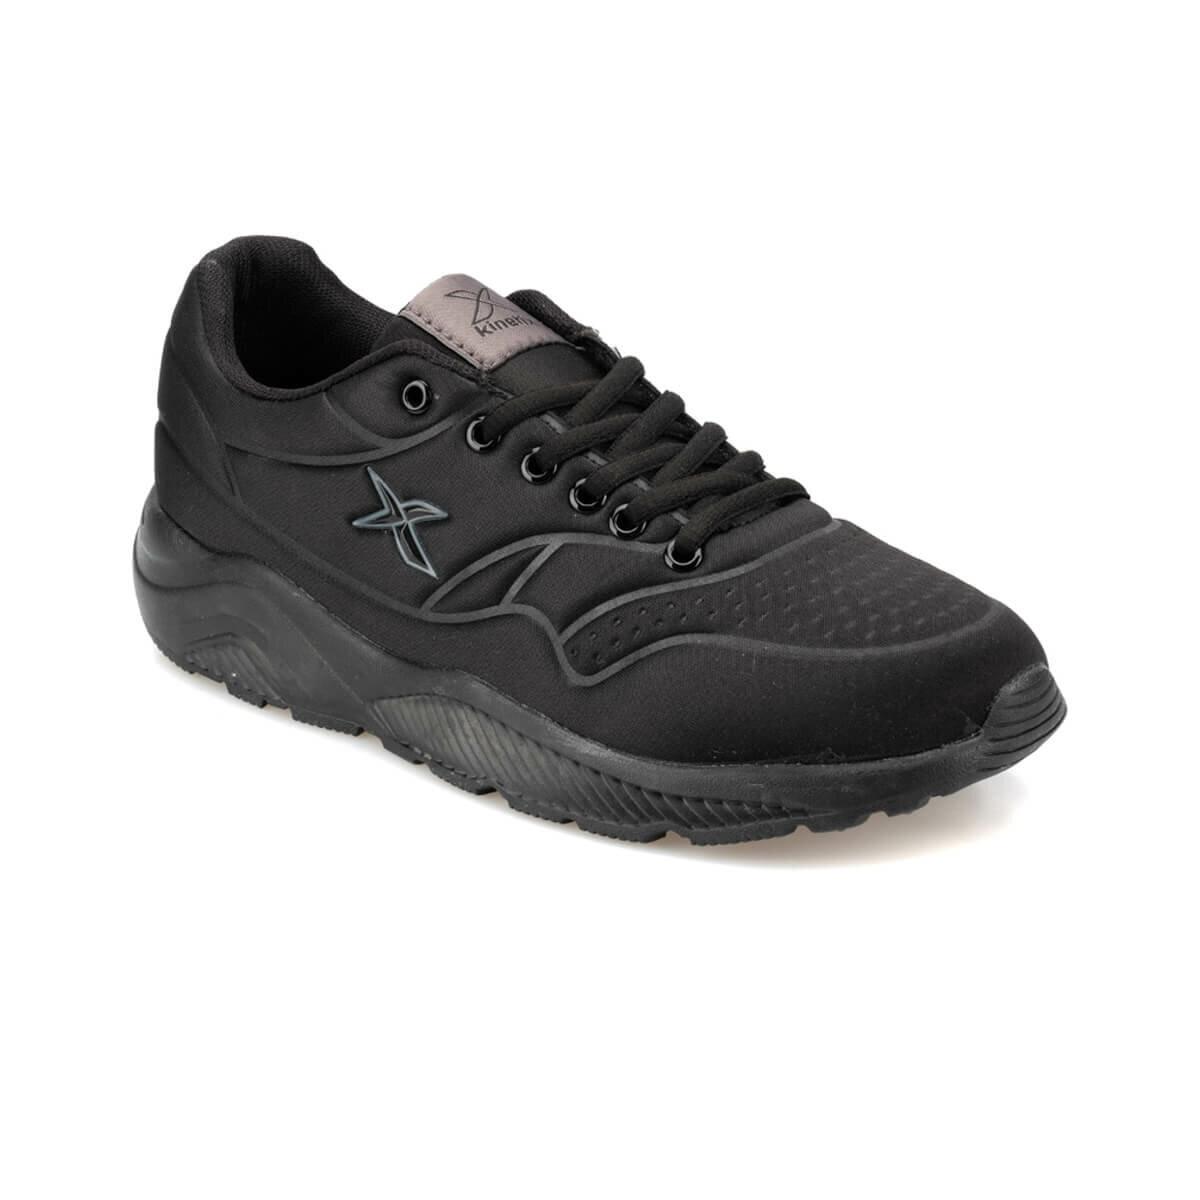 FLO KORT M 9PR Black Men 'S Sneaker Shoes KINETIX